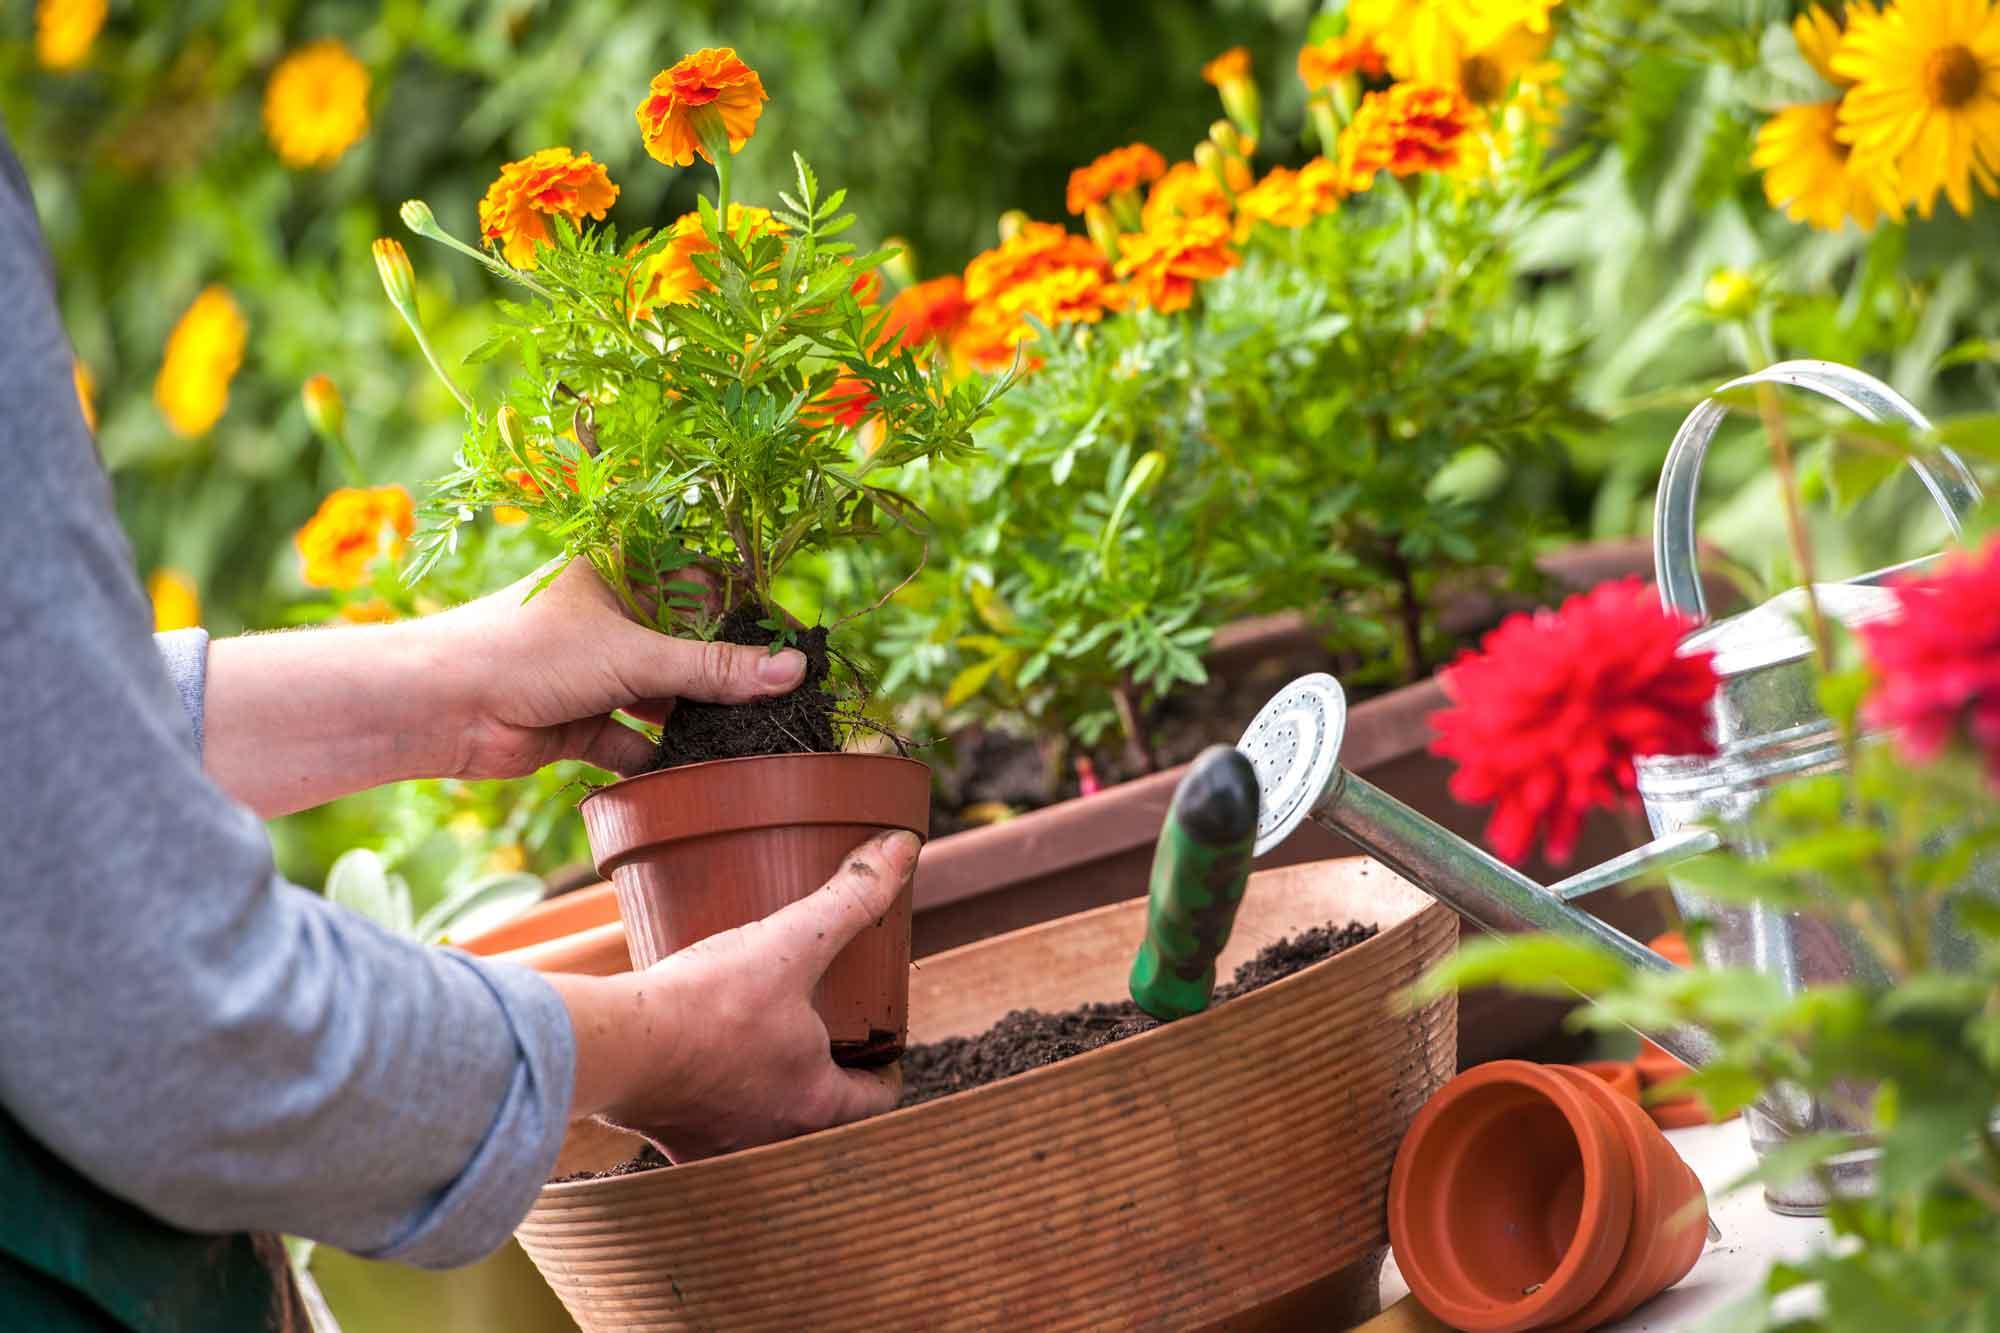 como plantar flores : horta